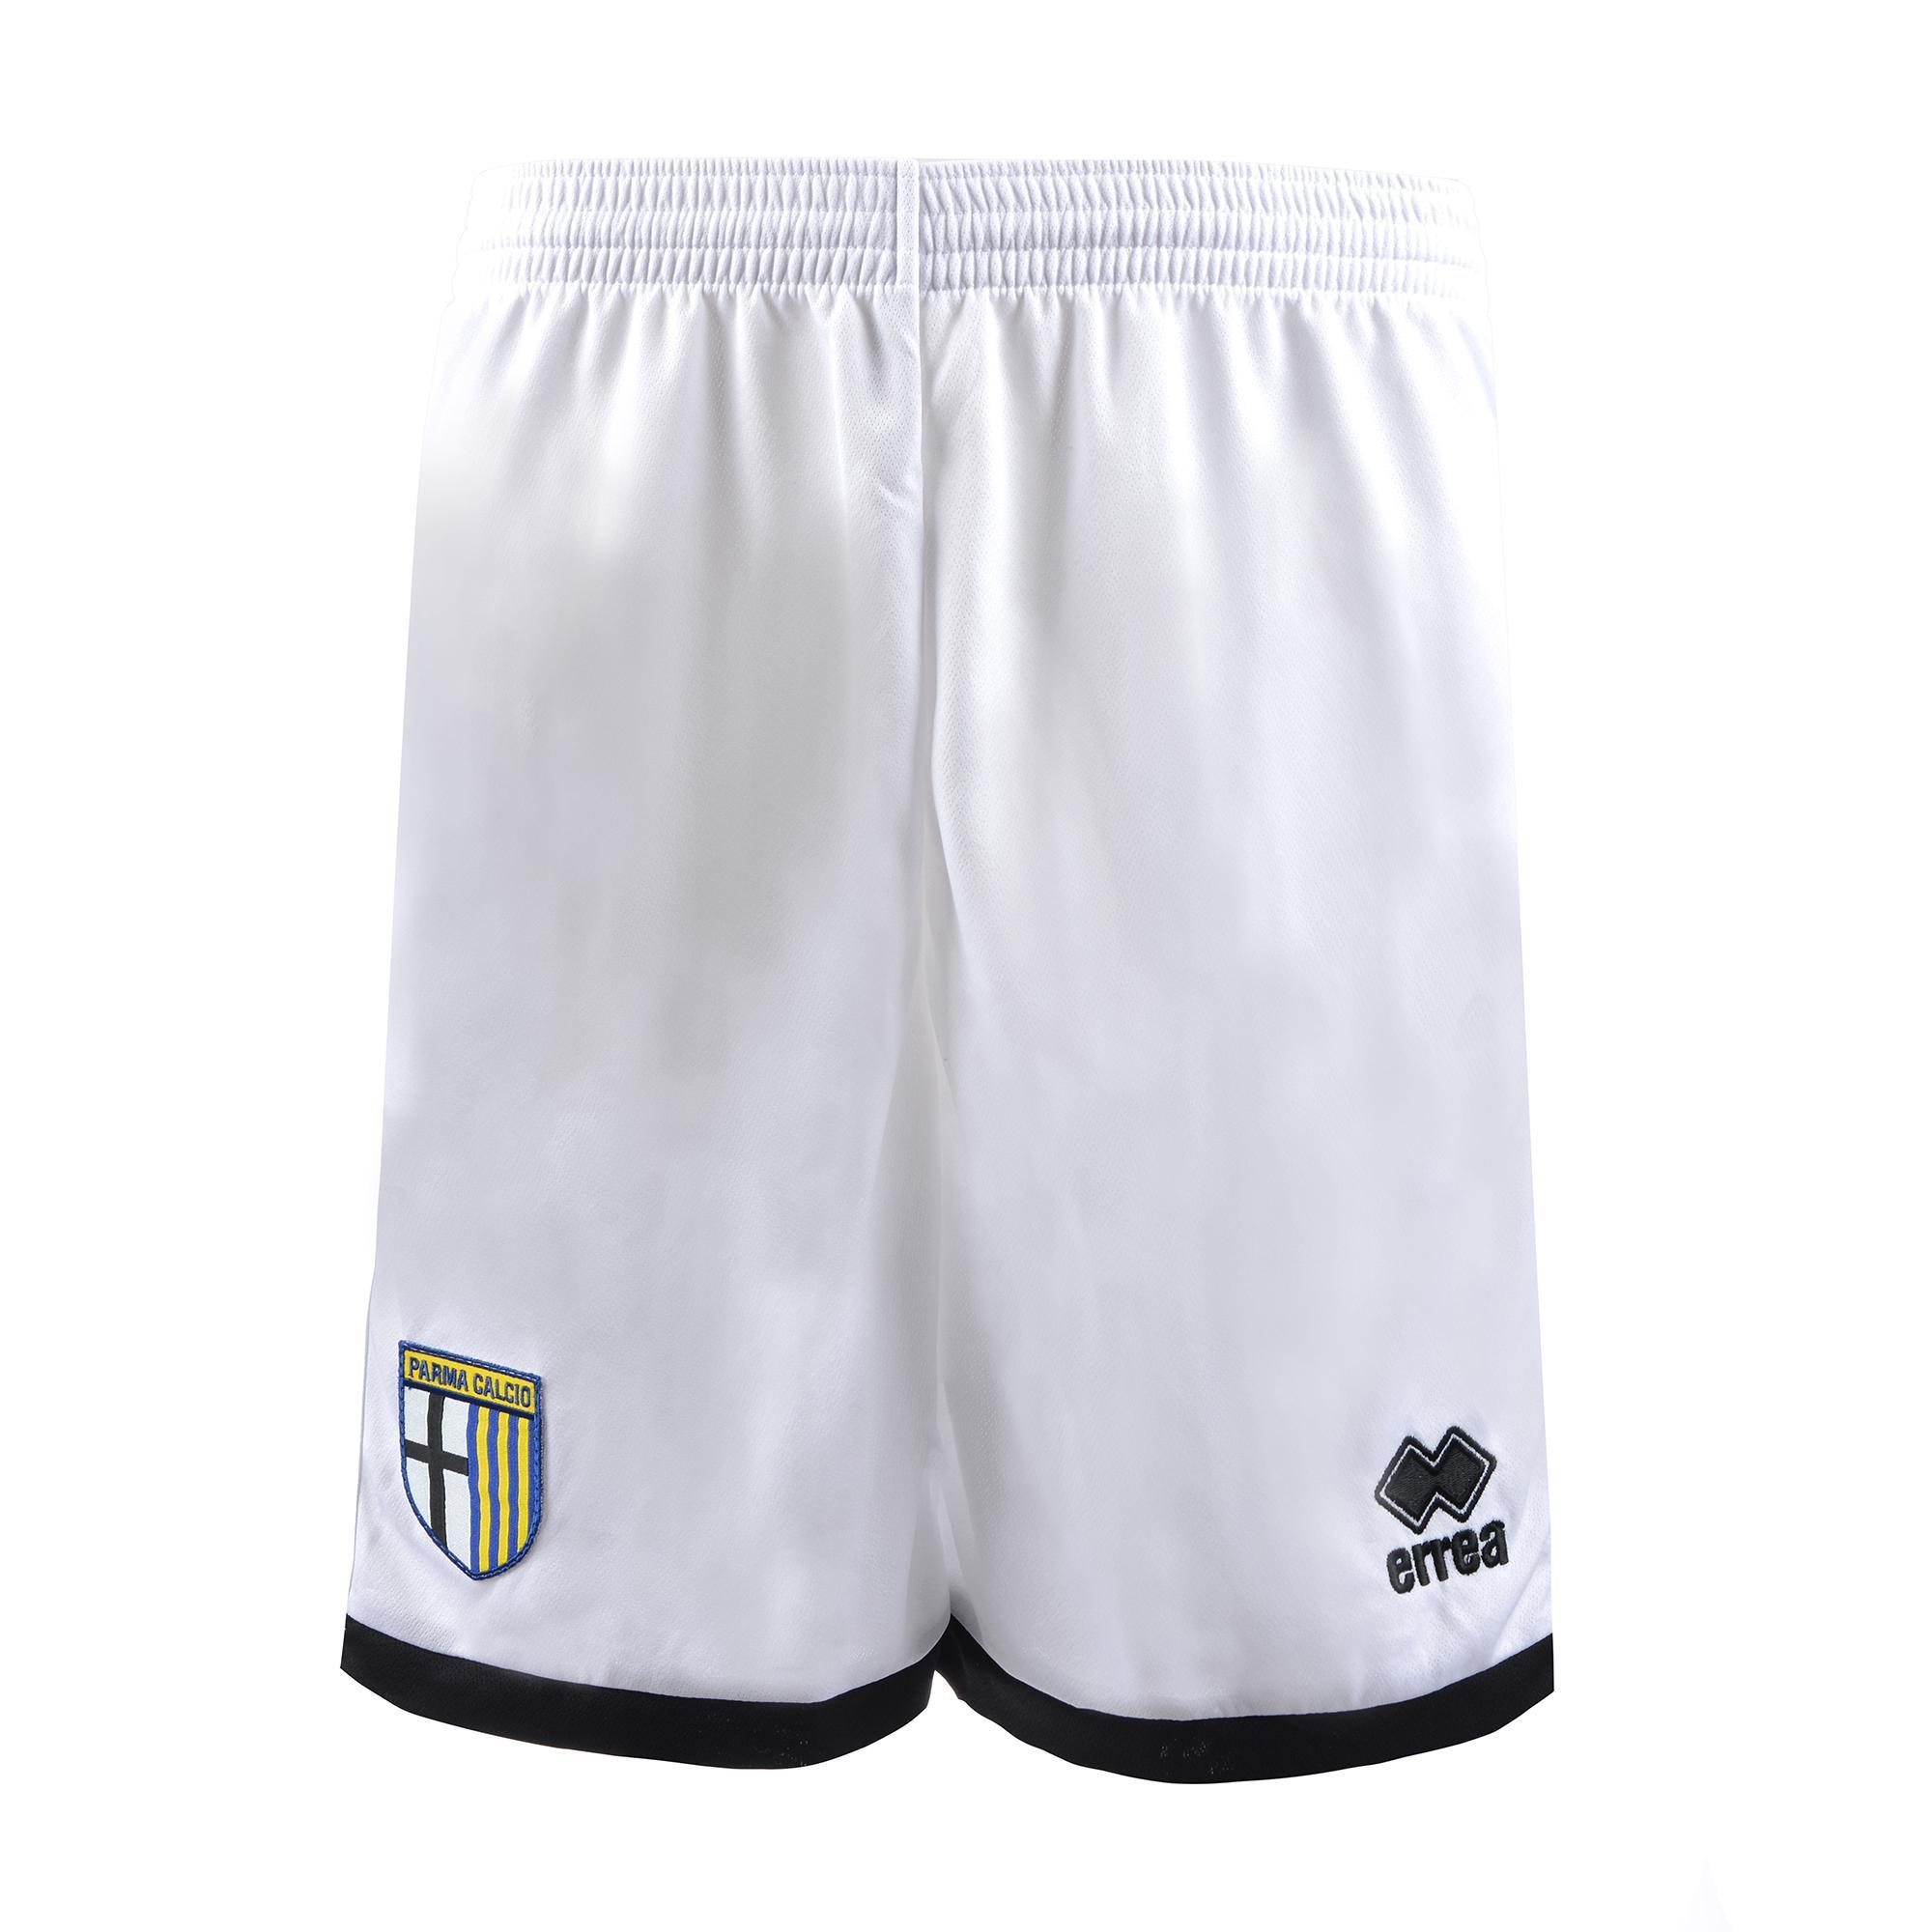 Errea Pantaloncini Gara Home Parma   18/19